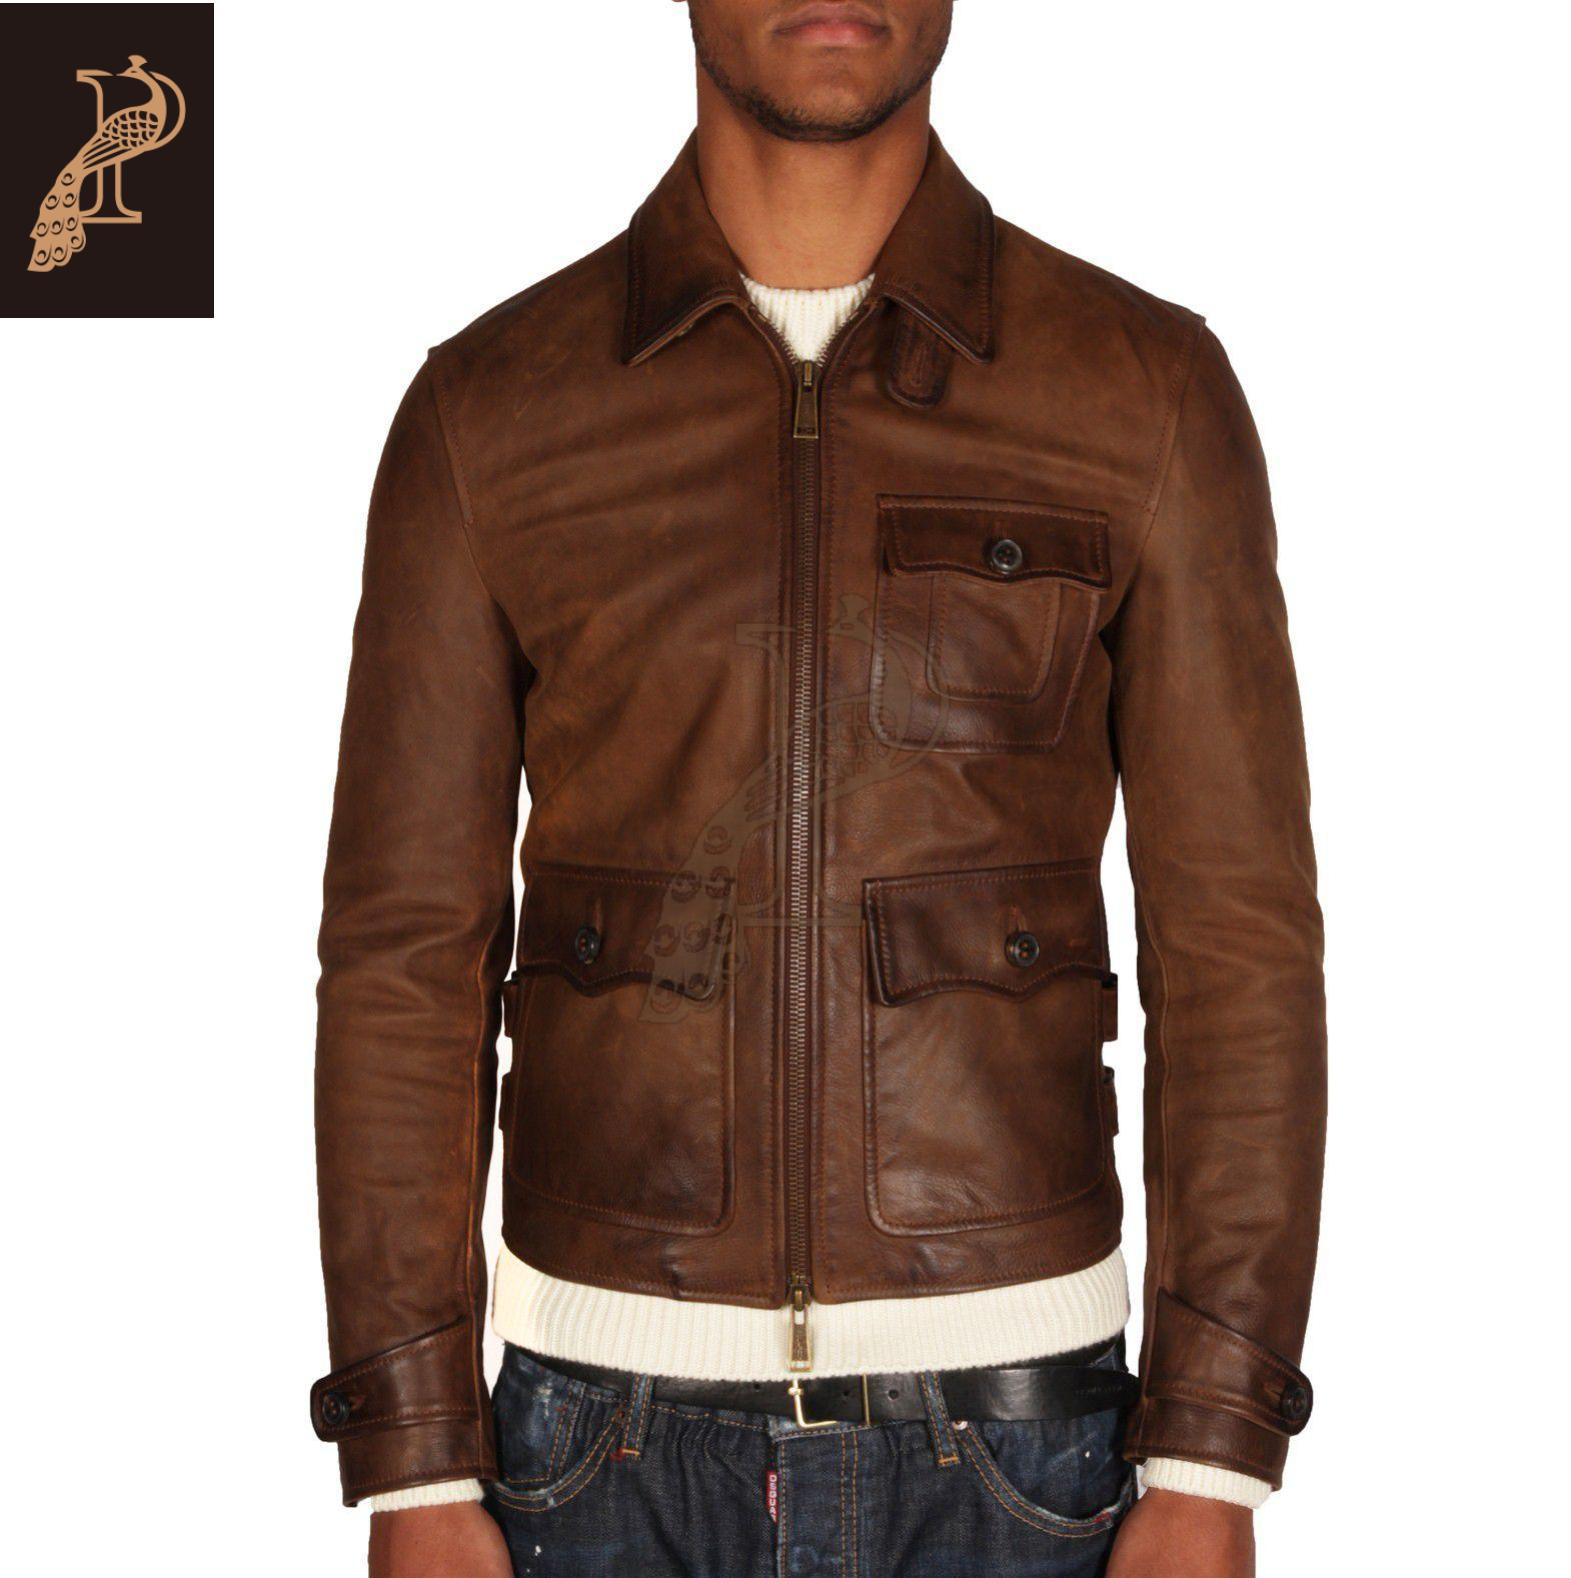 Одежда из кожи DSquared2 41378387bl